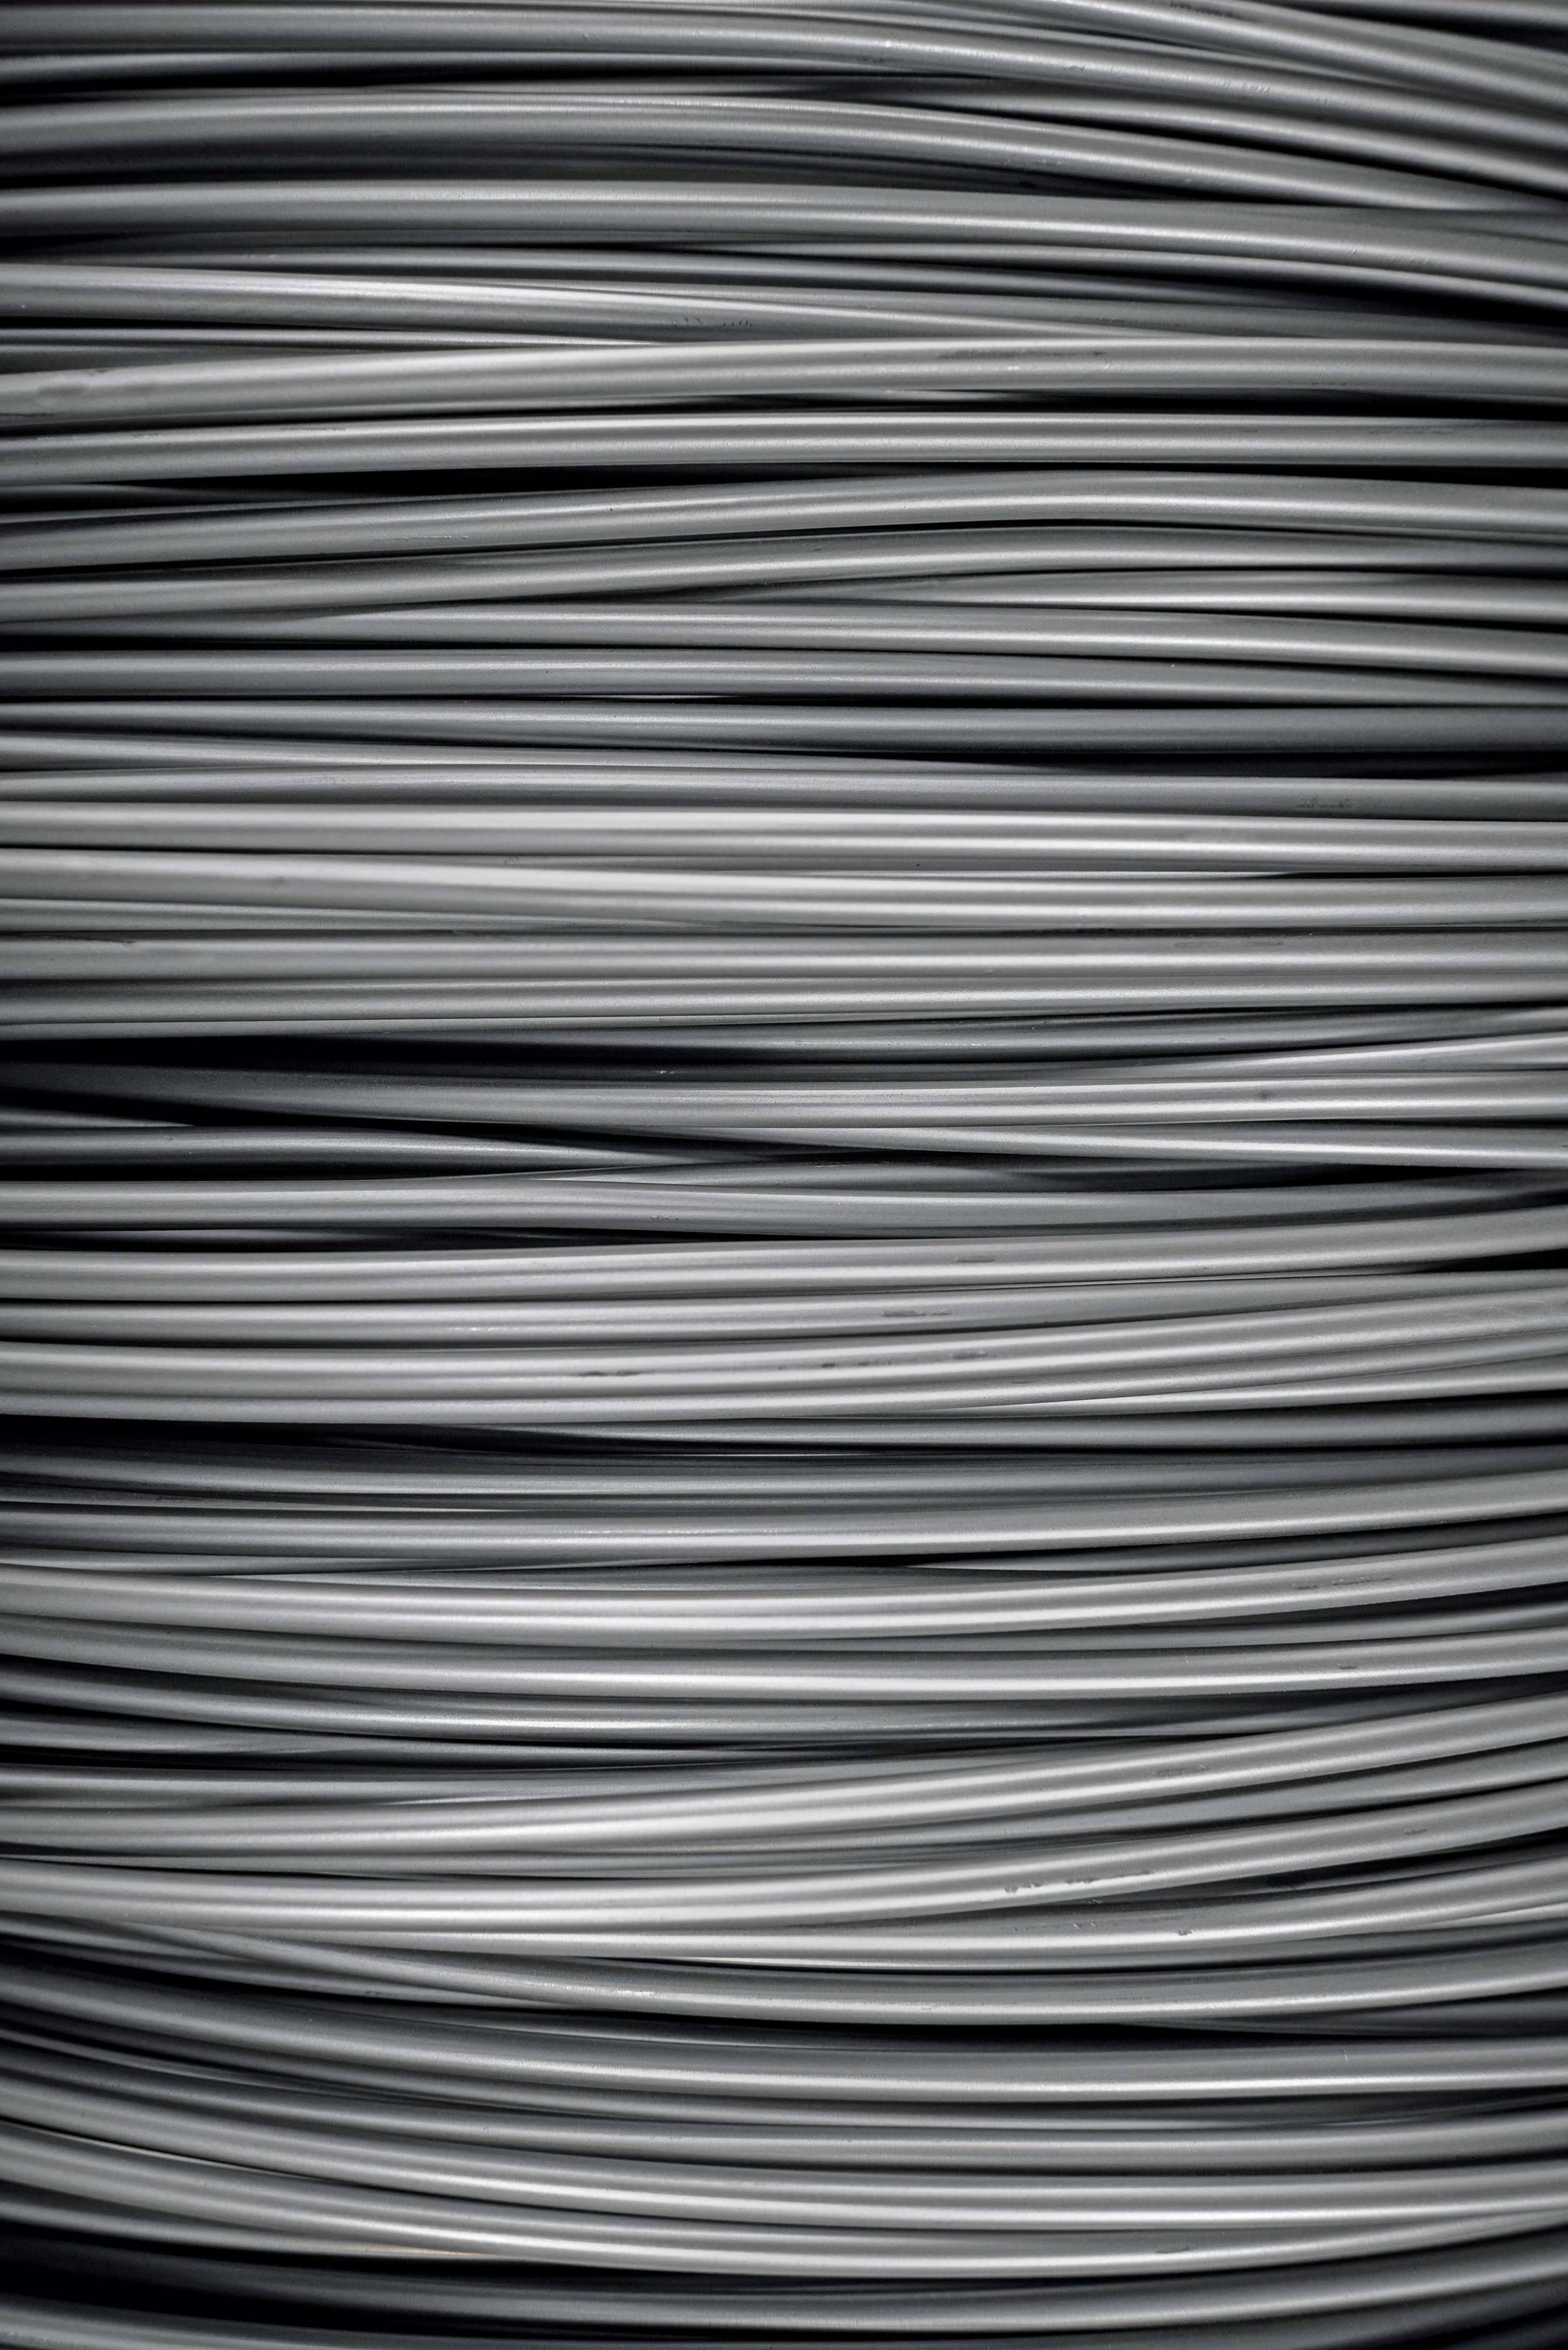 Draht Federdraht, spring wire